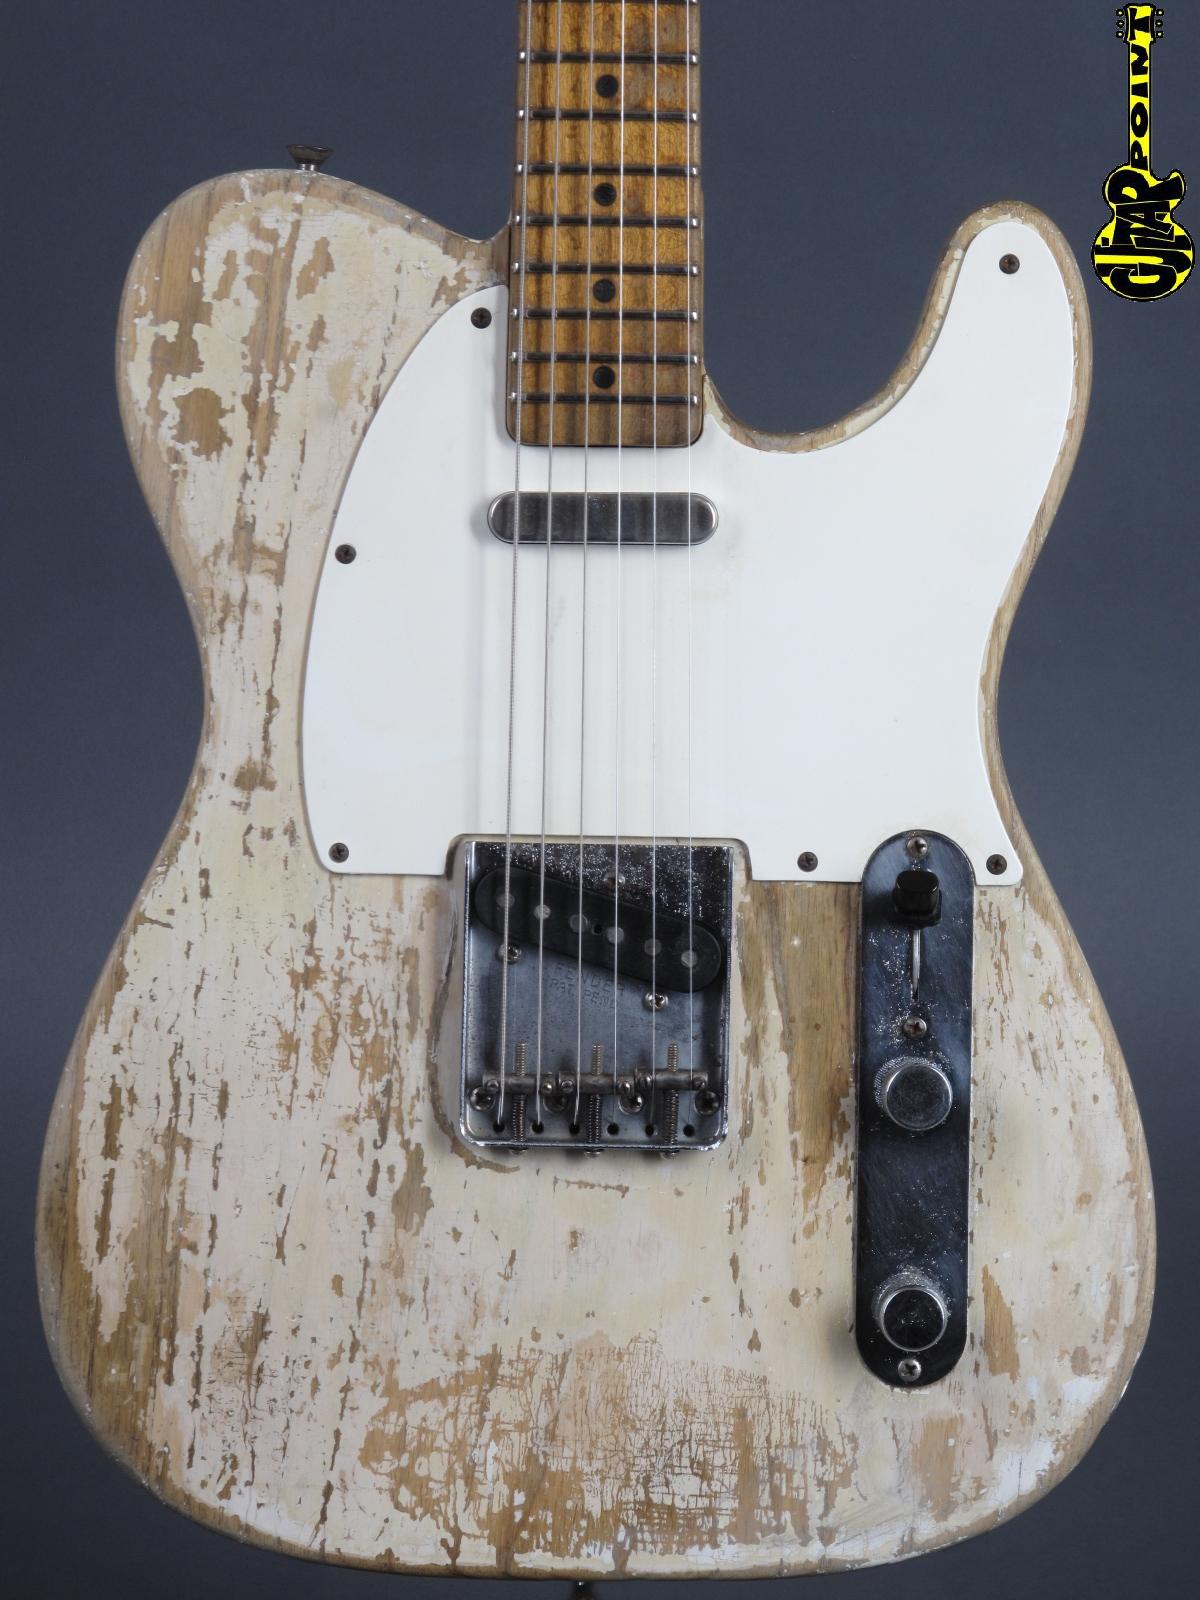 1957 Fender Telecaster - Blond    ...only 3,11 Kg !!!